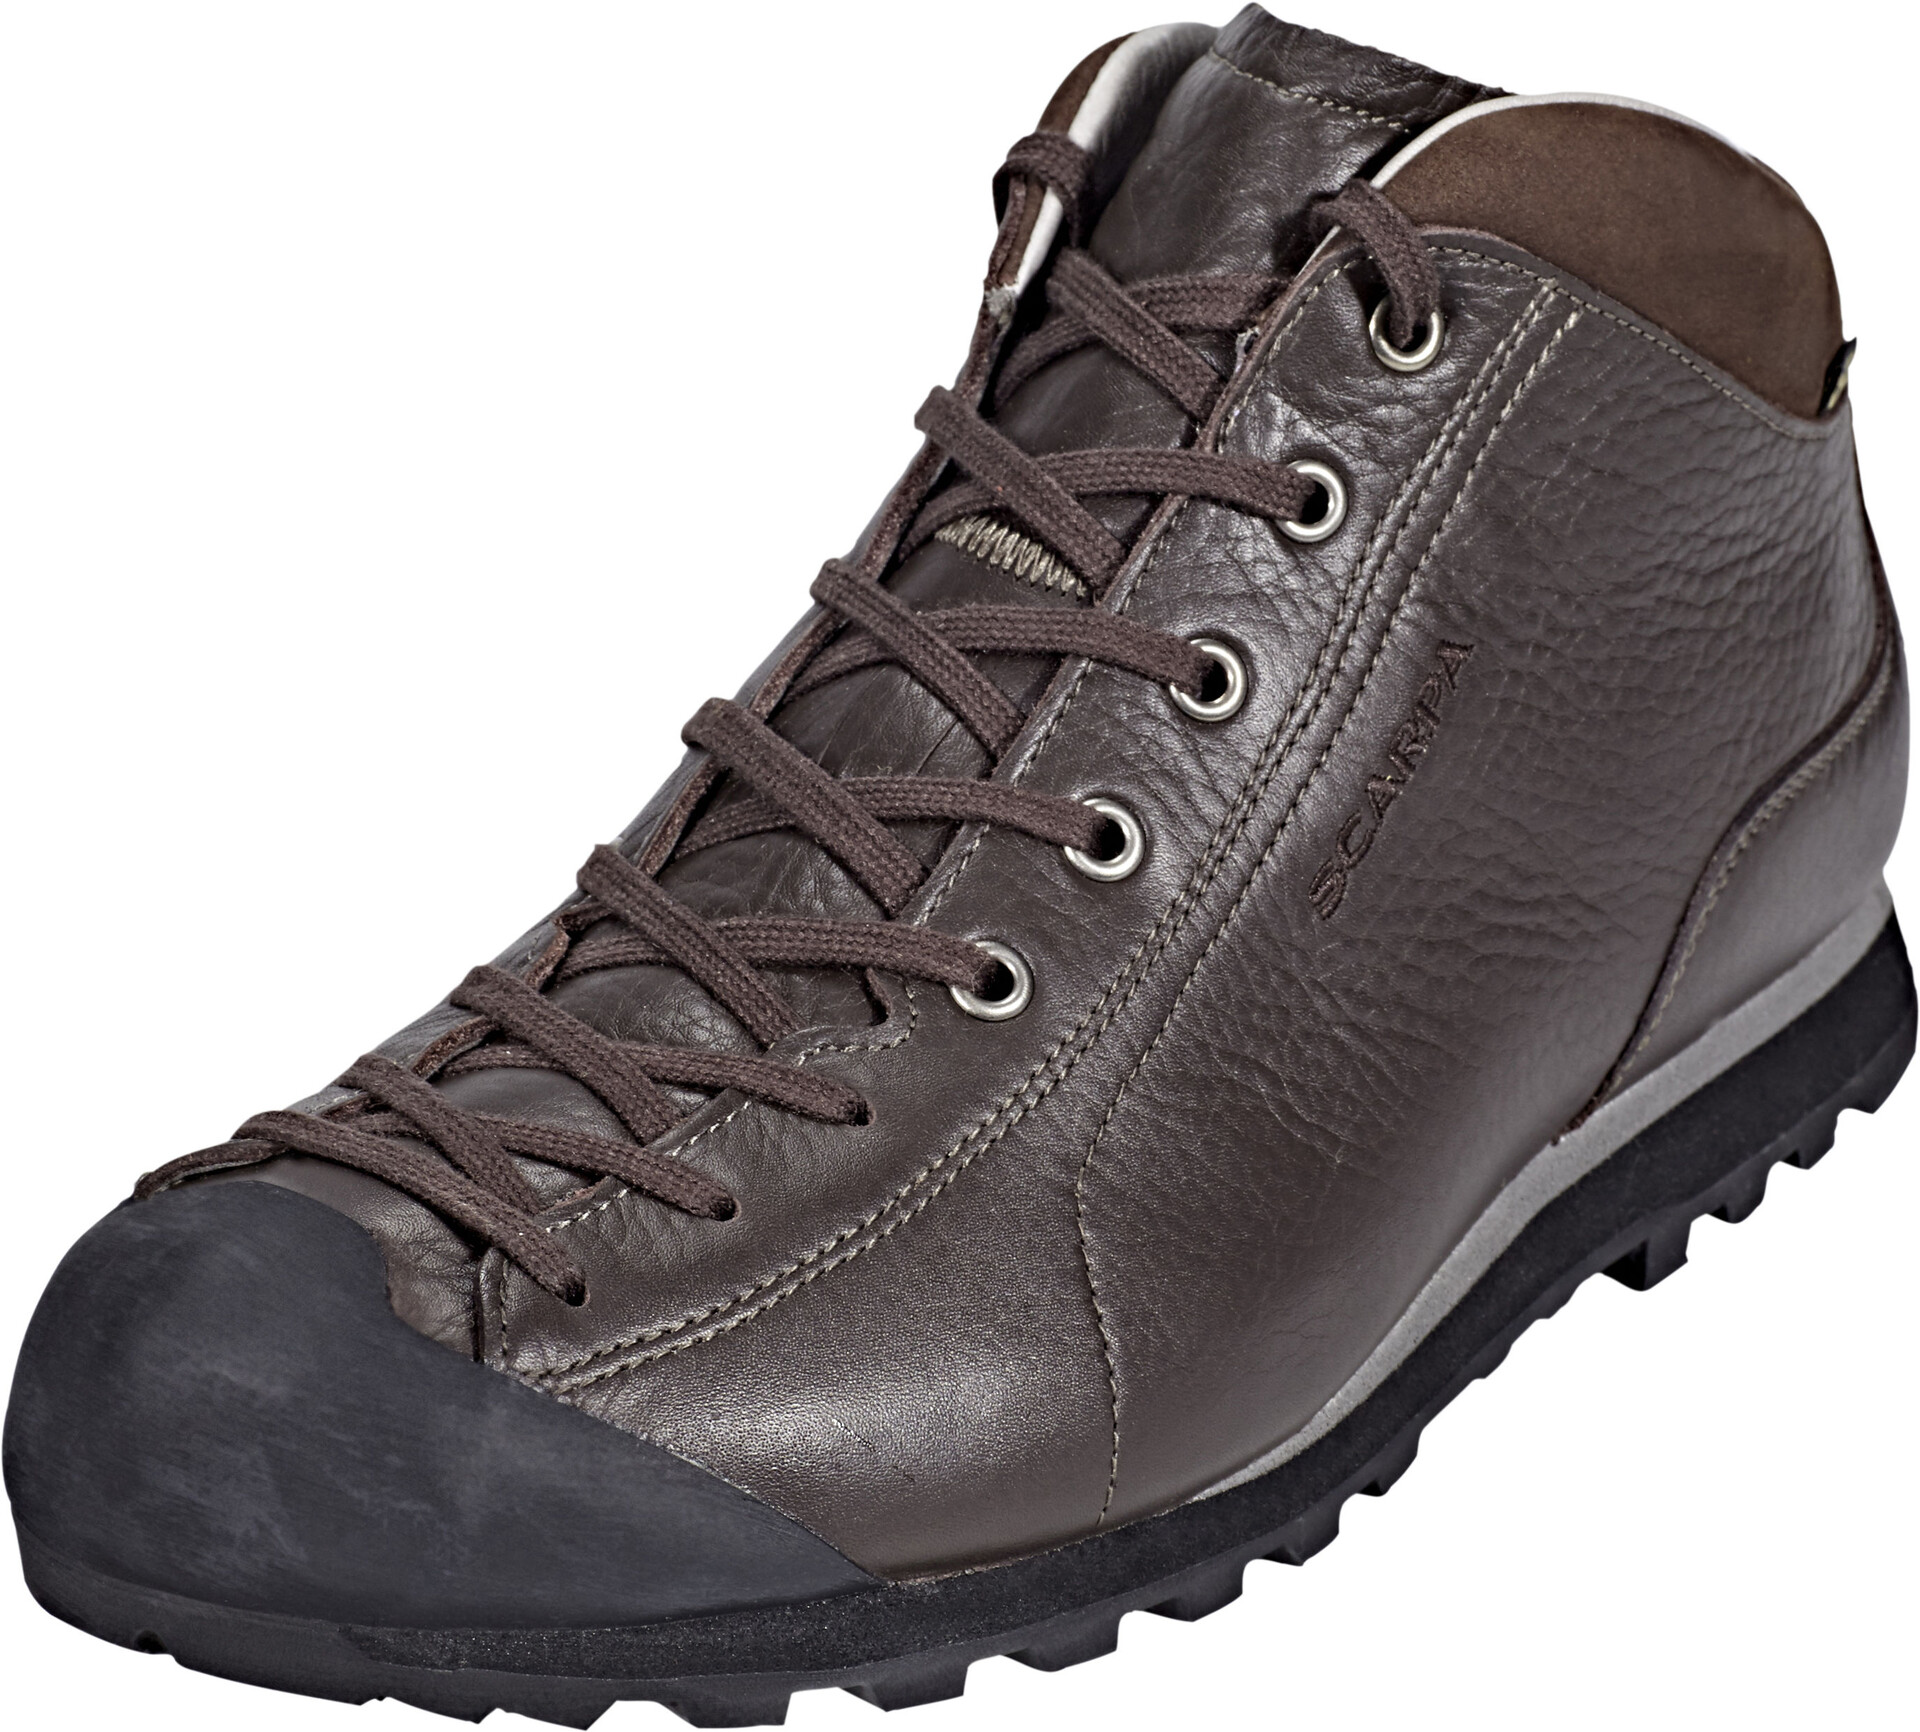 Scarpa Mojito Basic GTX Mid Cut Schuhe dark brown